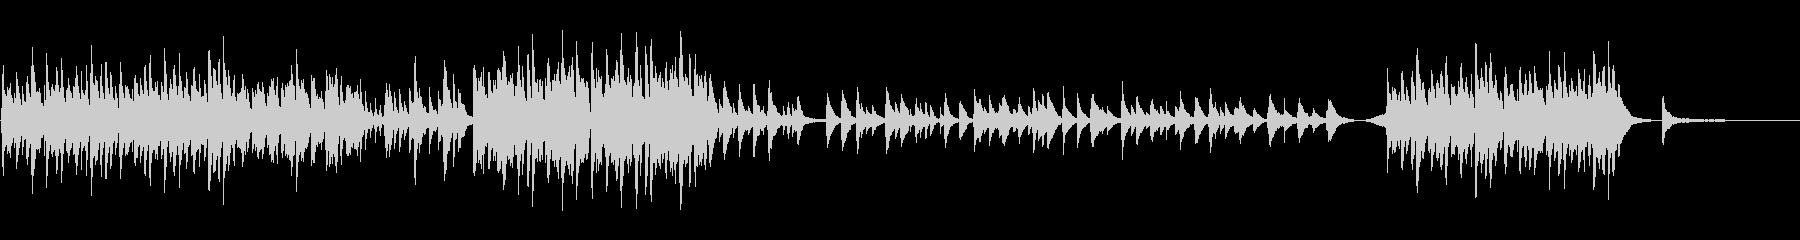 Piano 切ない Glocken オルの未再生の波形